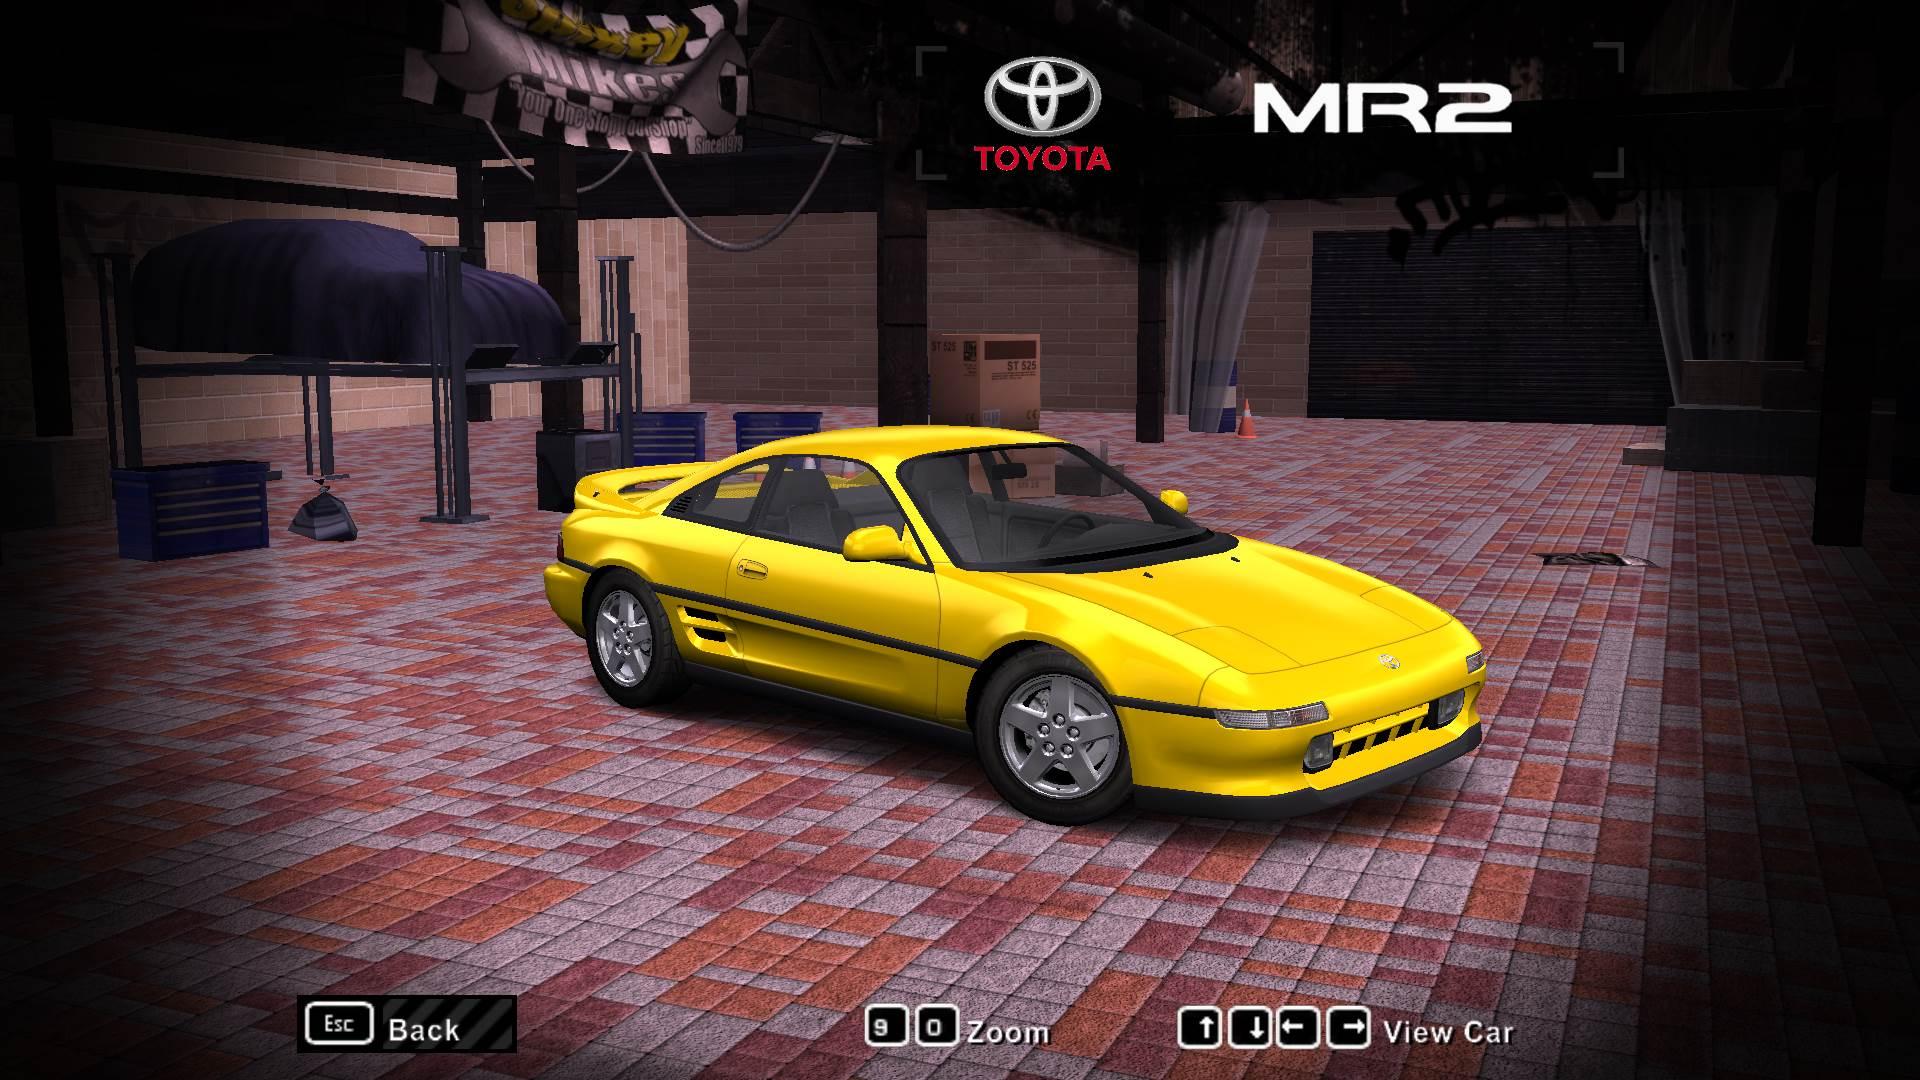 ToyotaMR2_NFSMW_1.jpg